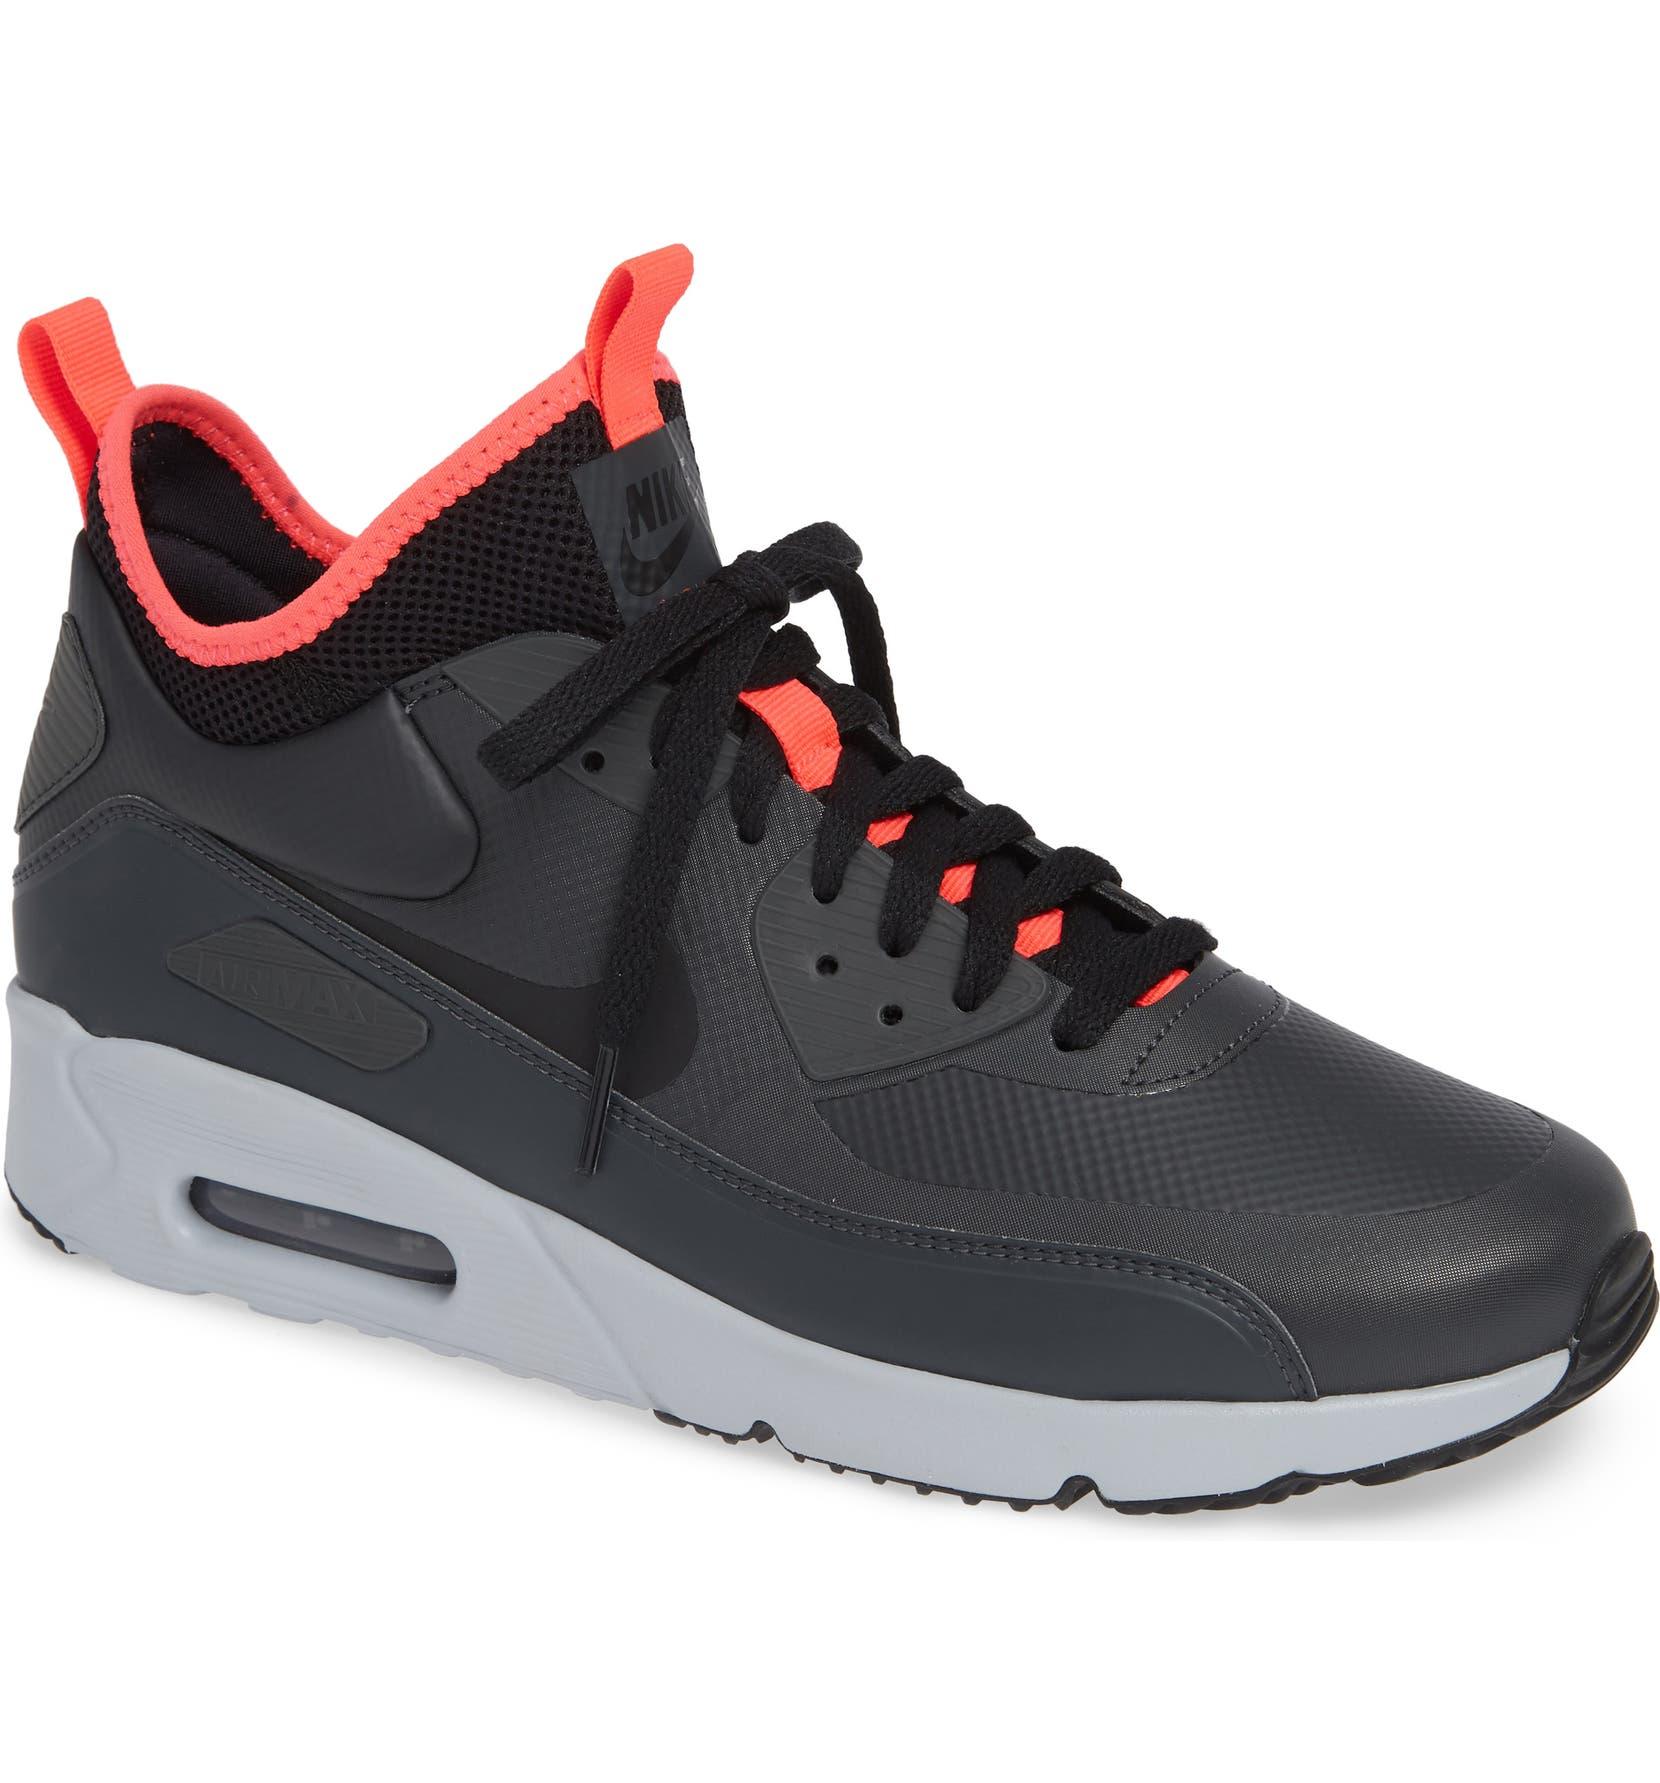 NIKE AIR MAX 90 ULTRA MID WINTER Herren Black Sneaker